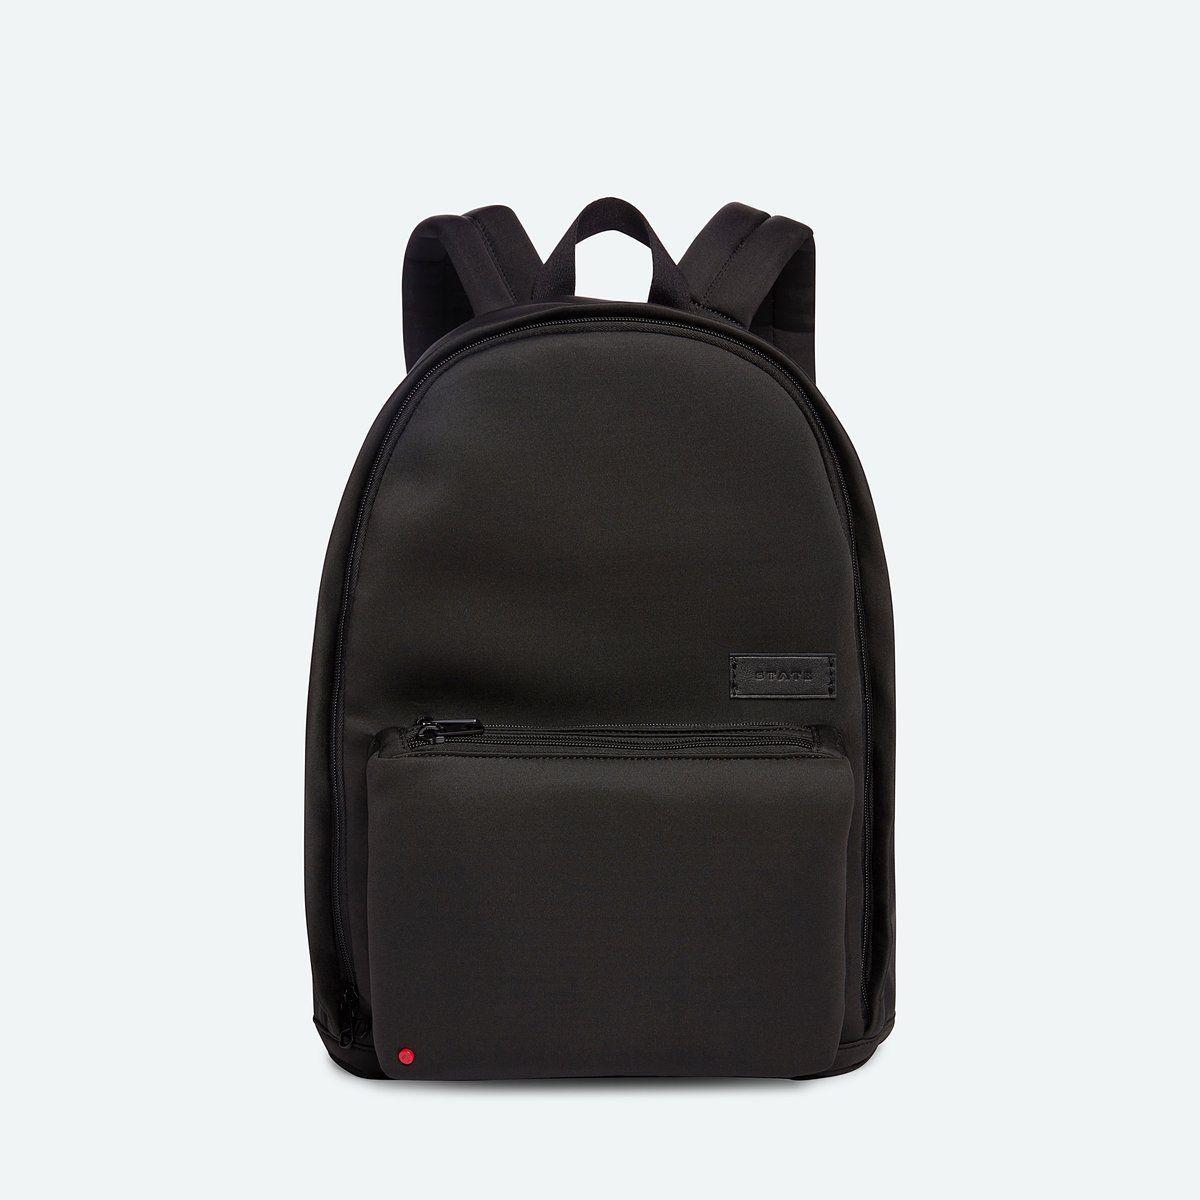 bc41c5591d8 fashionbackpacksmens